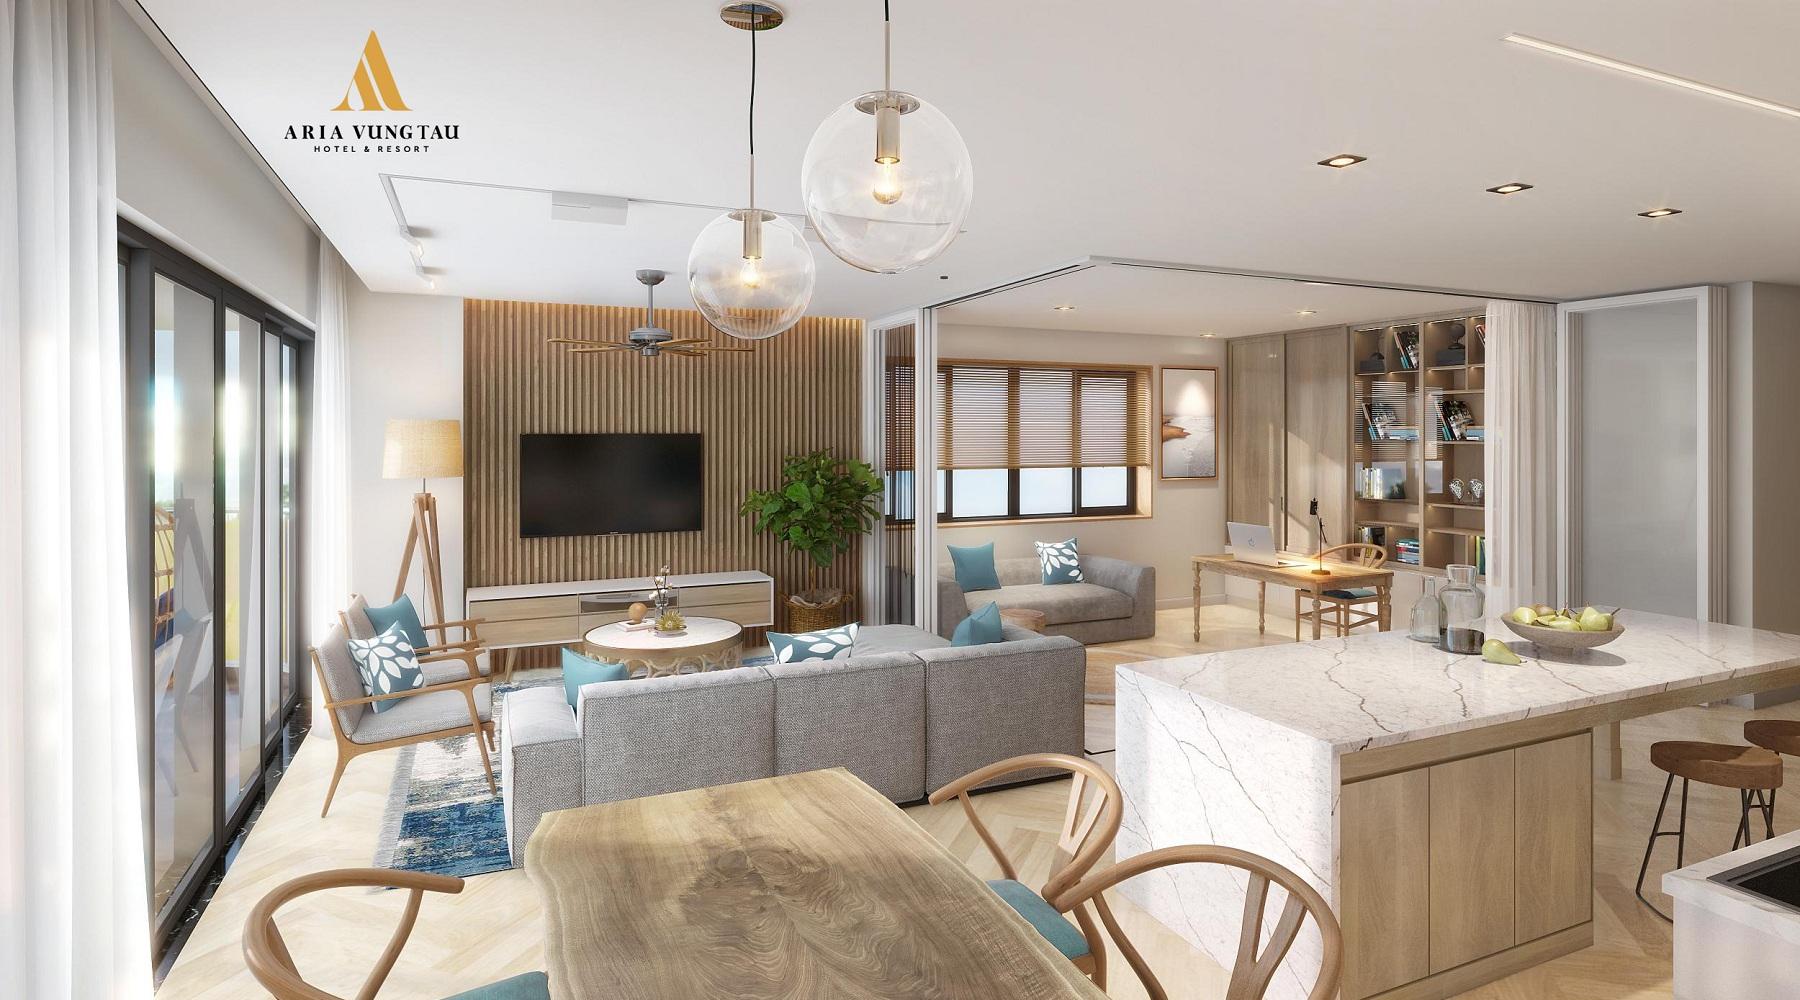 http://charmington.org/public/upload/aria-vung-tau-hotel-resort-living-room-2-1576246341.jpg